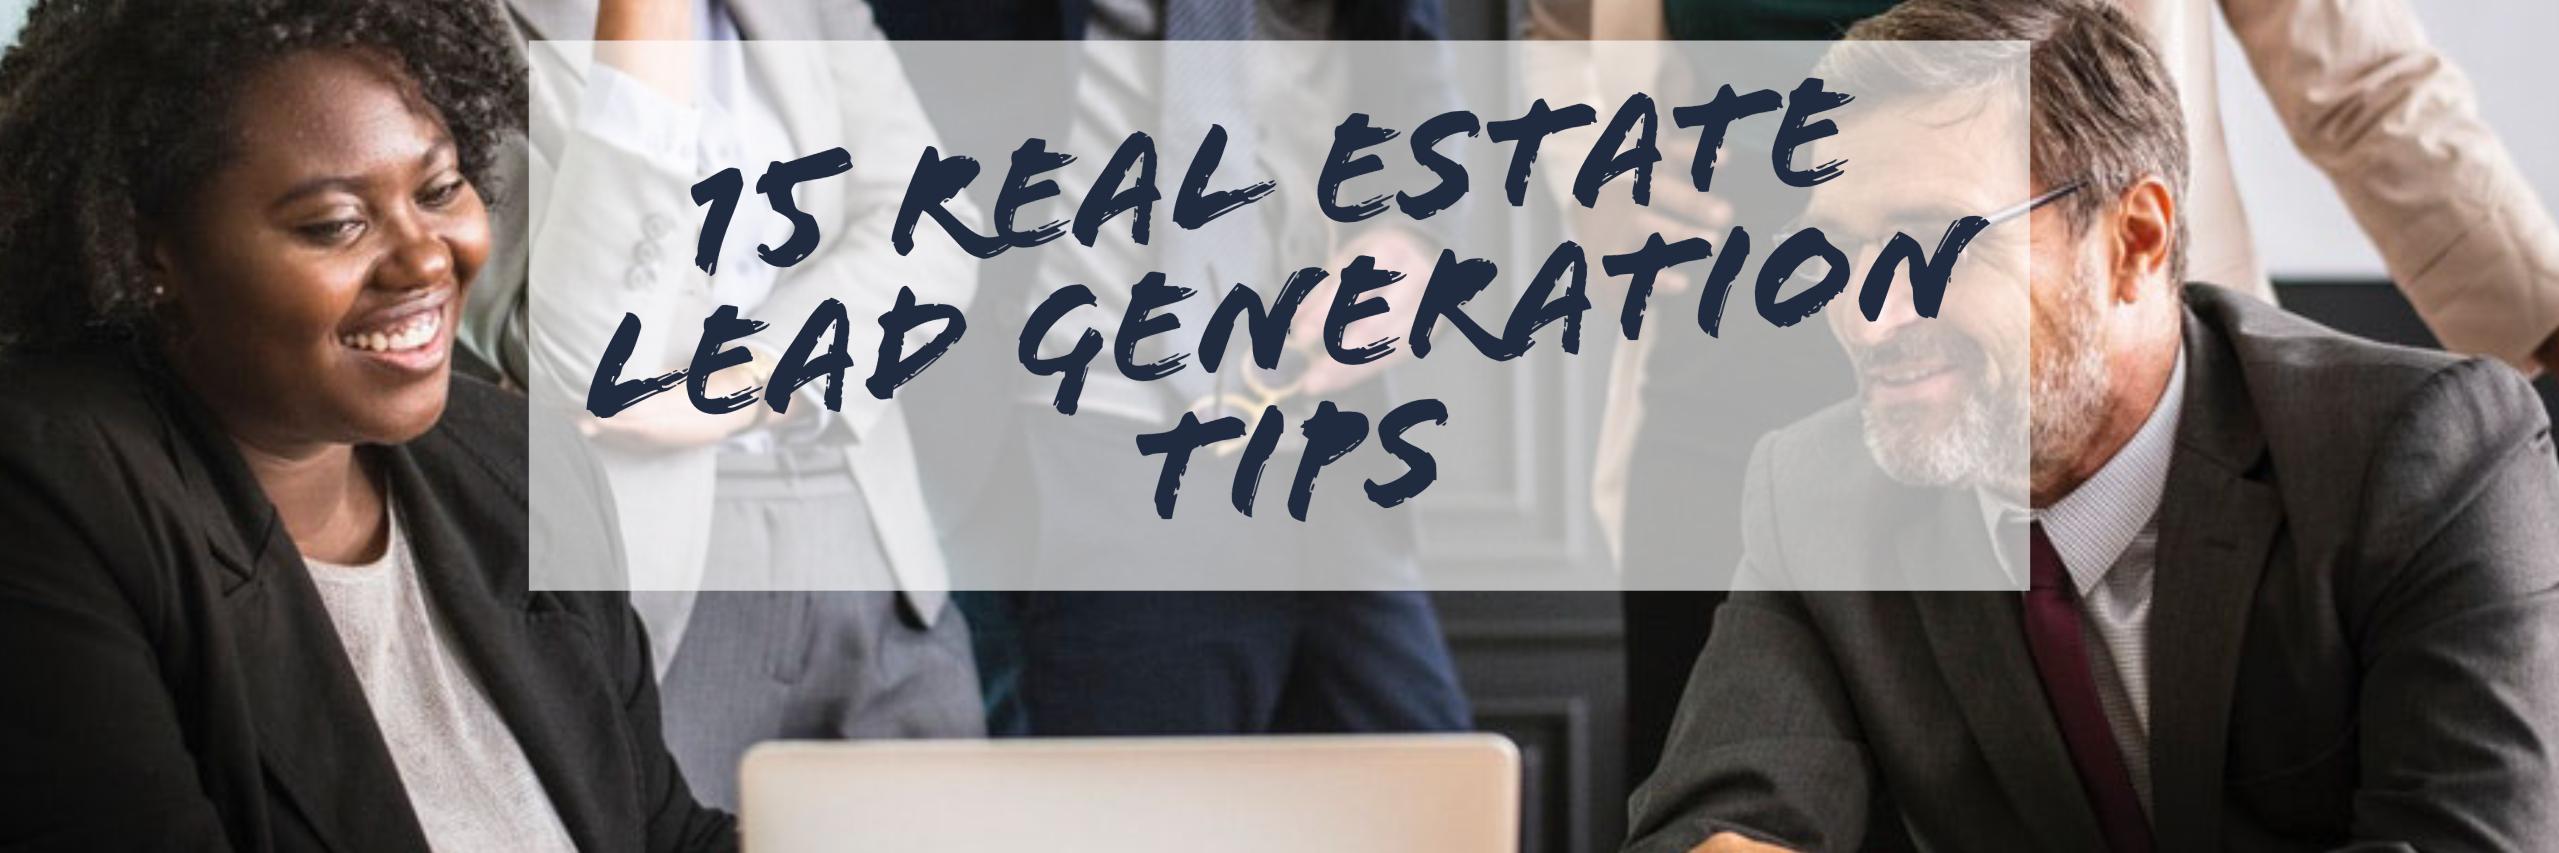 15 Lead Generation Tips